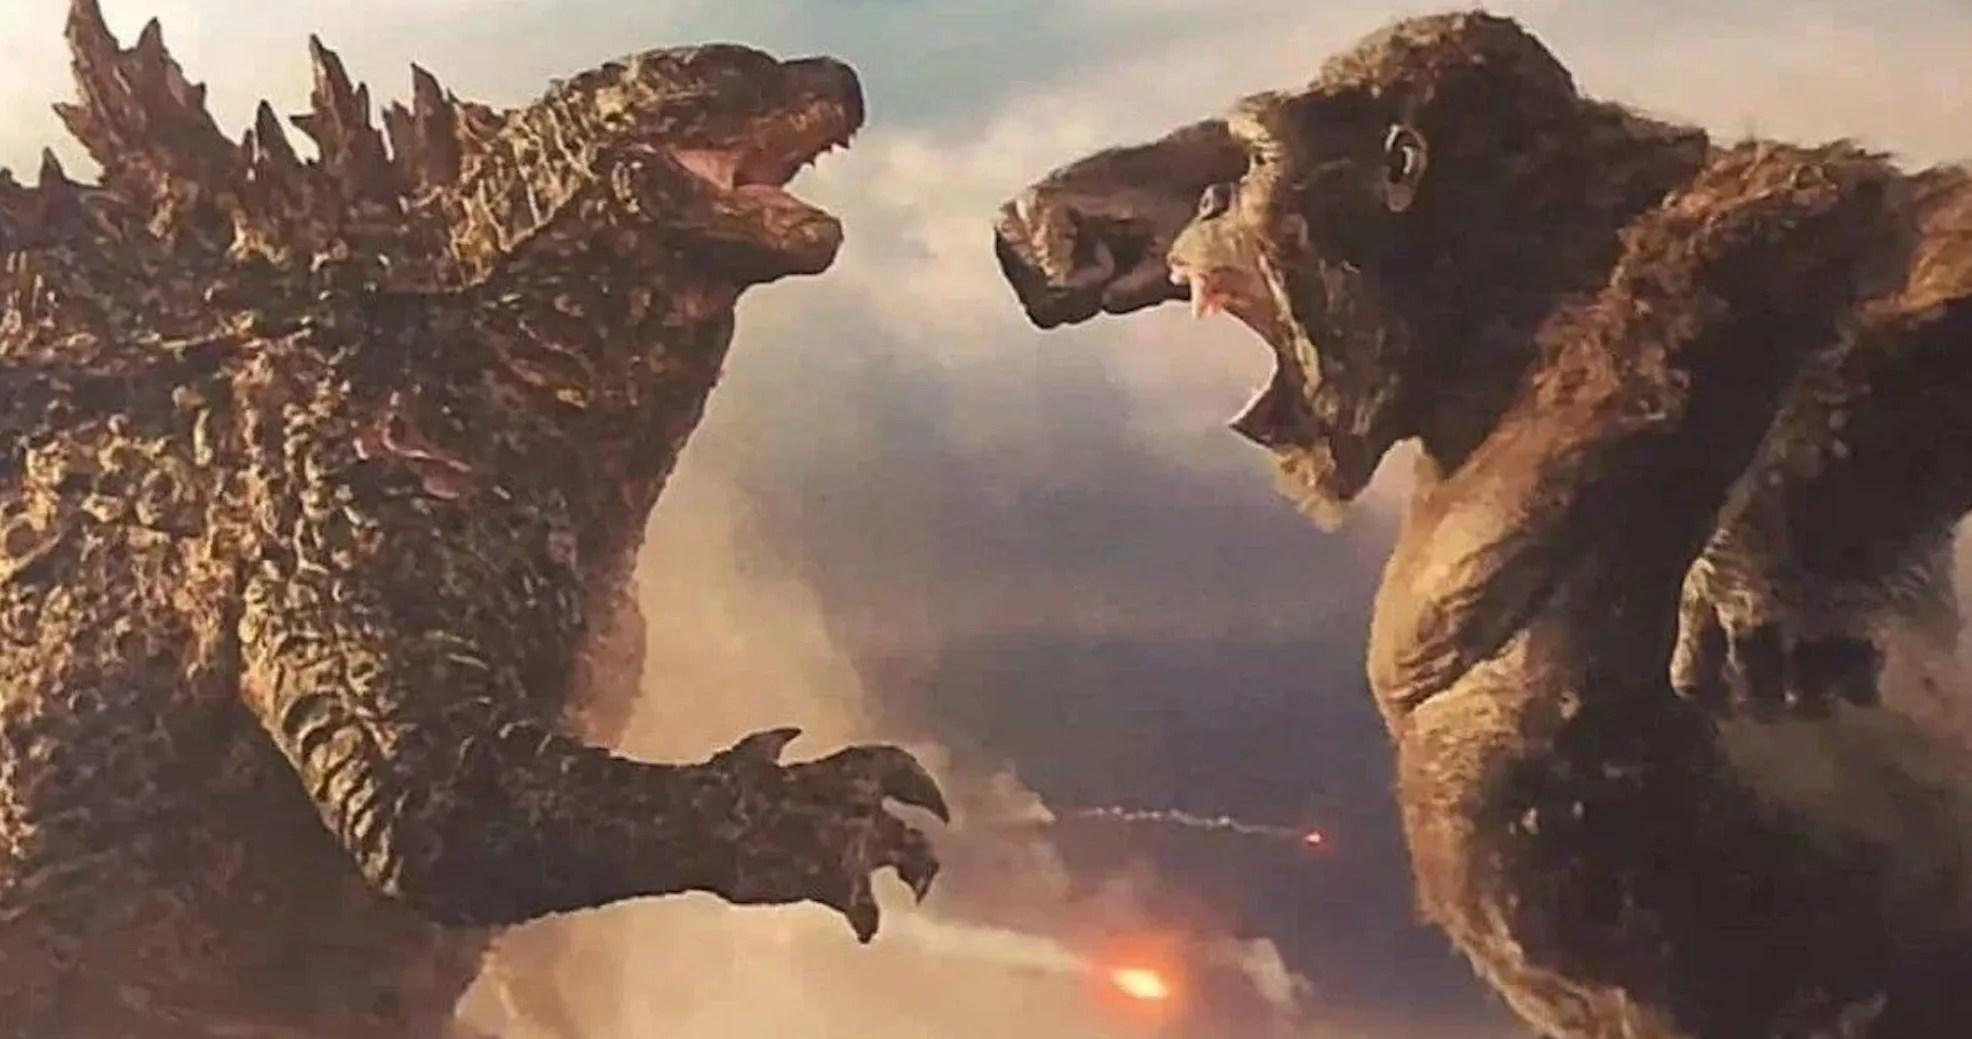 'Godzilla Vs. Kong' Has Lowest Budget in Legendary's 'MonsterVerse' Franchise